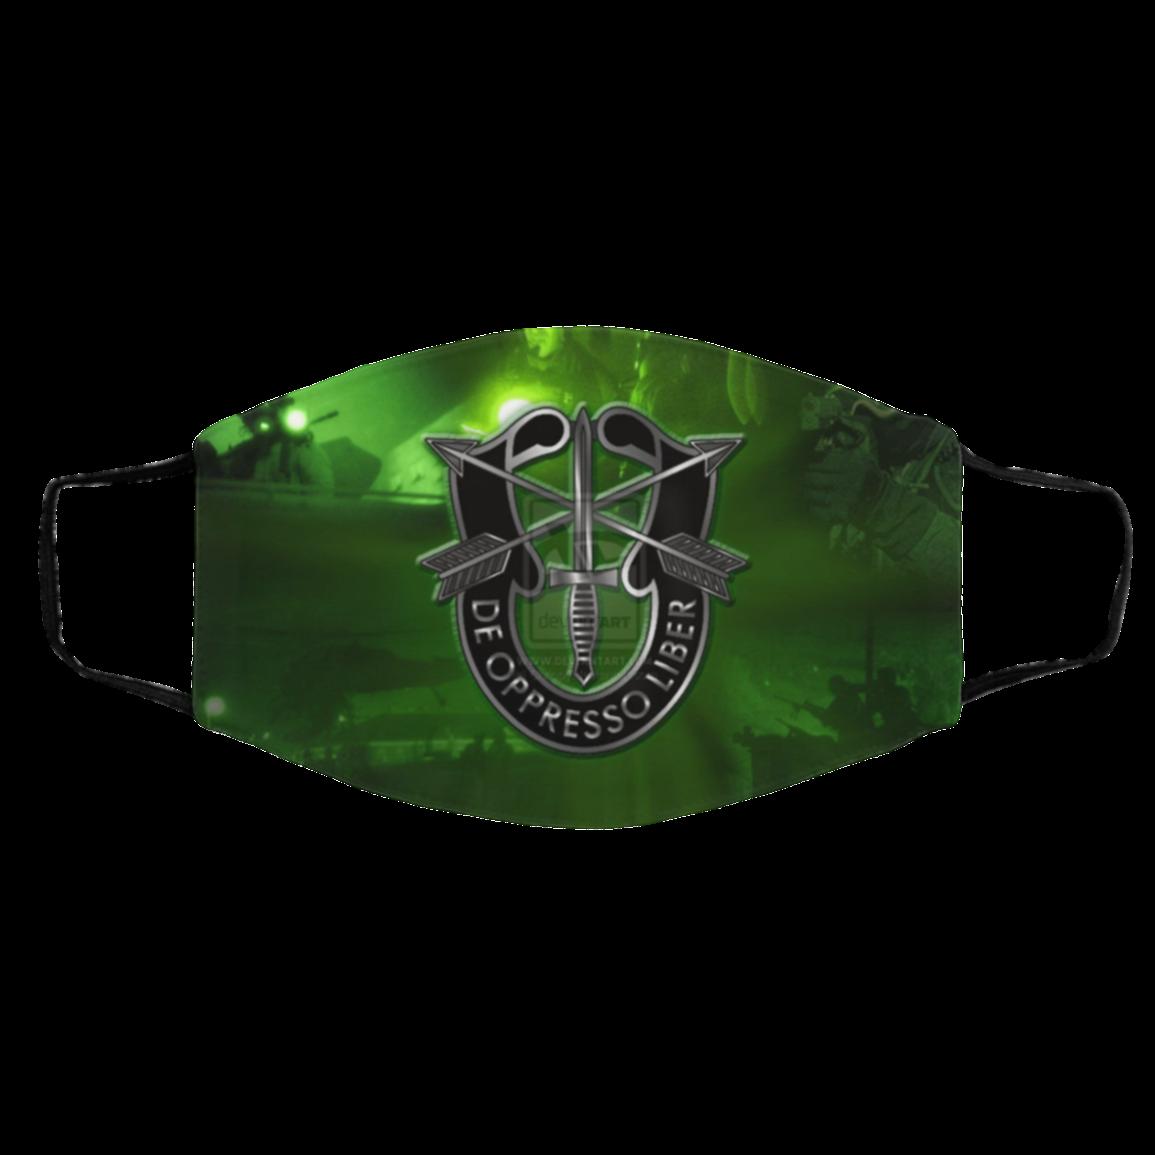 Masks A-rm-y Sp–c=ial Forc-es Gr-een Berets US Face Mask